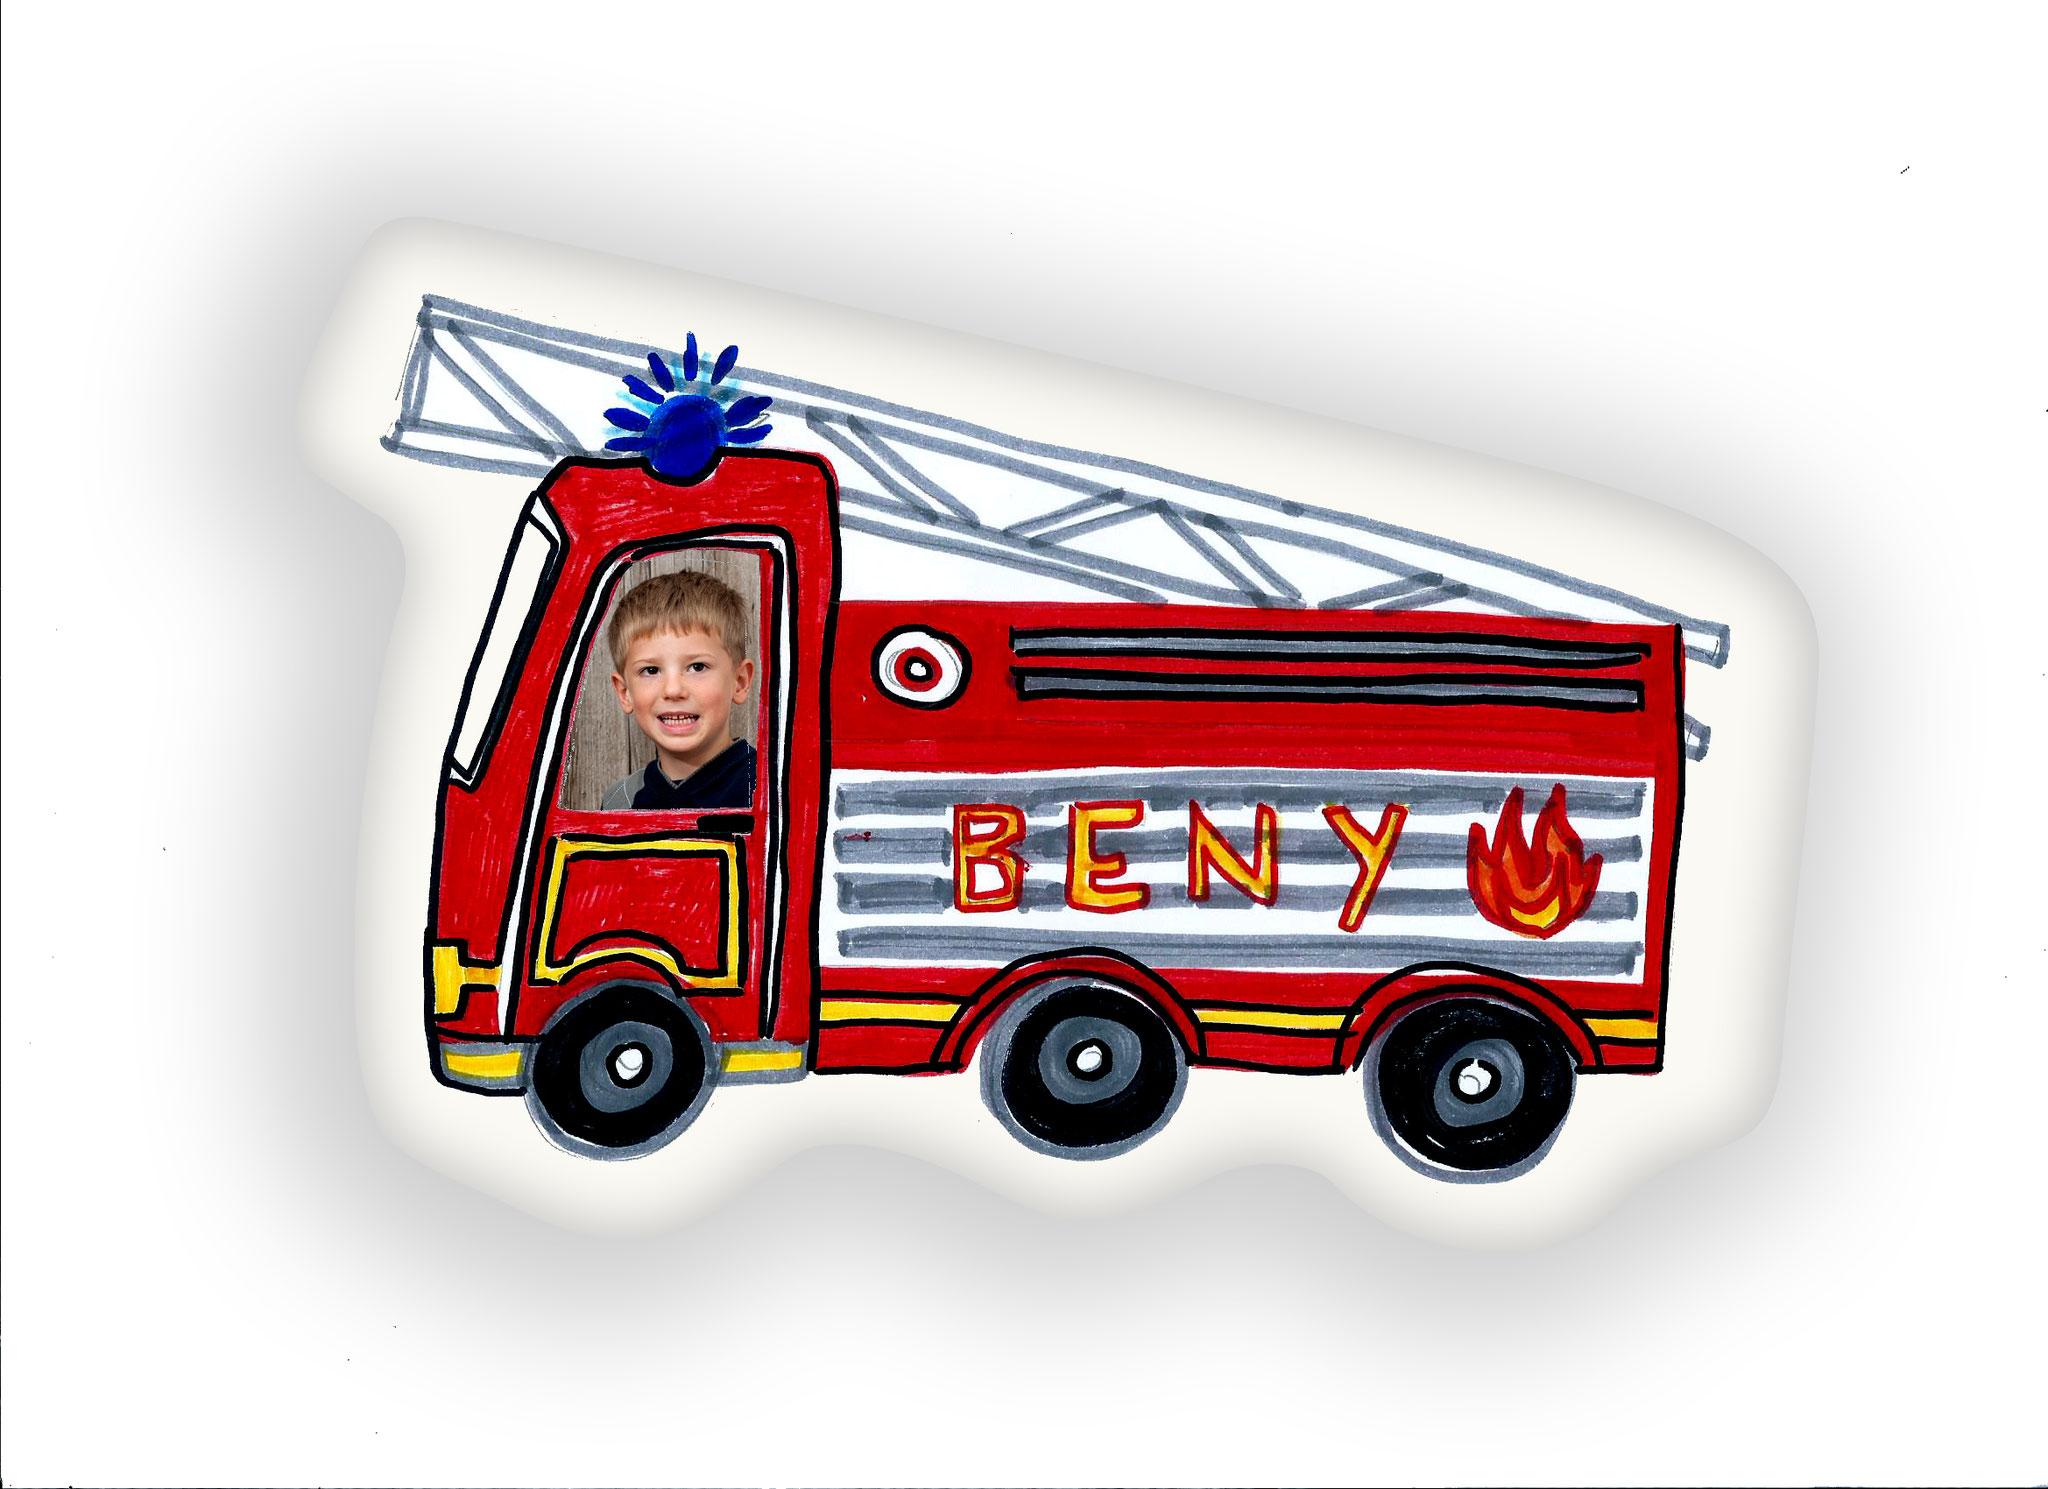 Feuerwehrkissen, Feuerwehr, Kissen, Kinderkissen, Namenskissen, Junggs Kissen